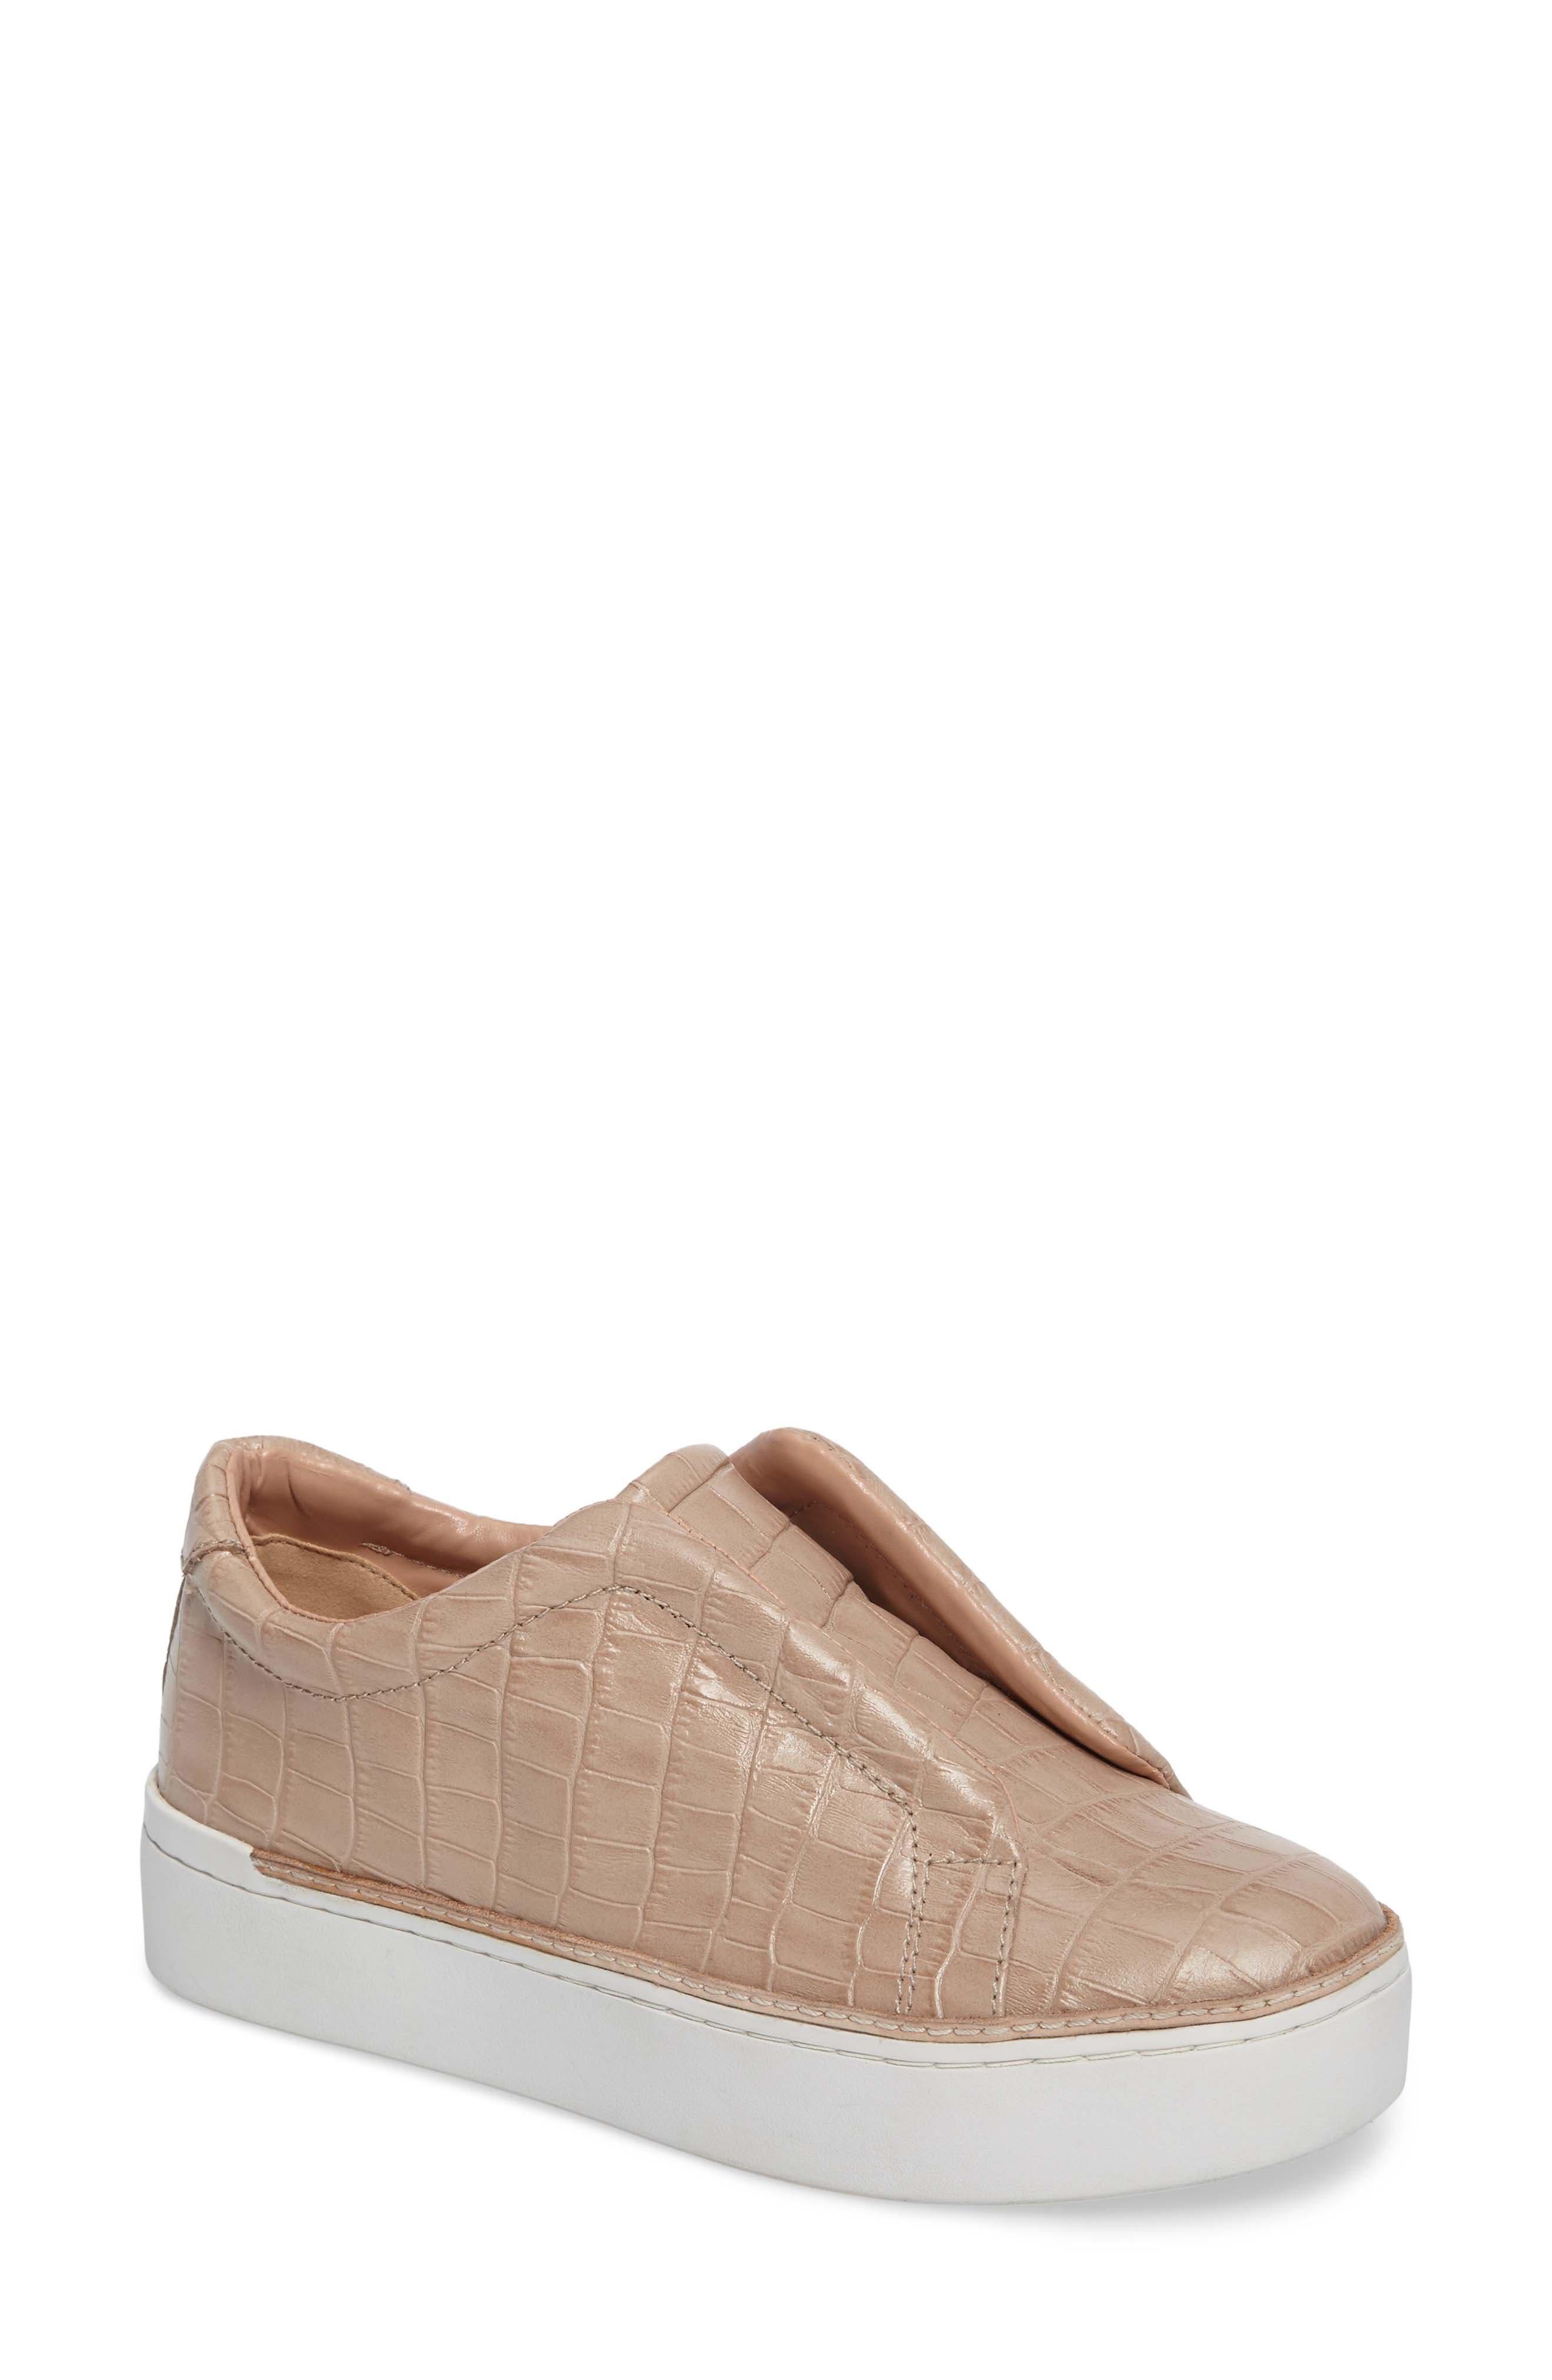 M4D3 Super Slip-On Sneaker- Beige